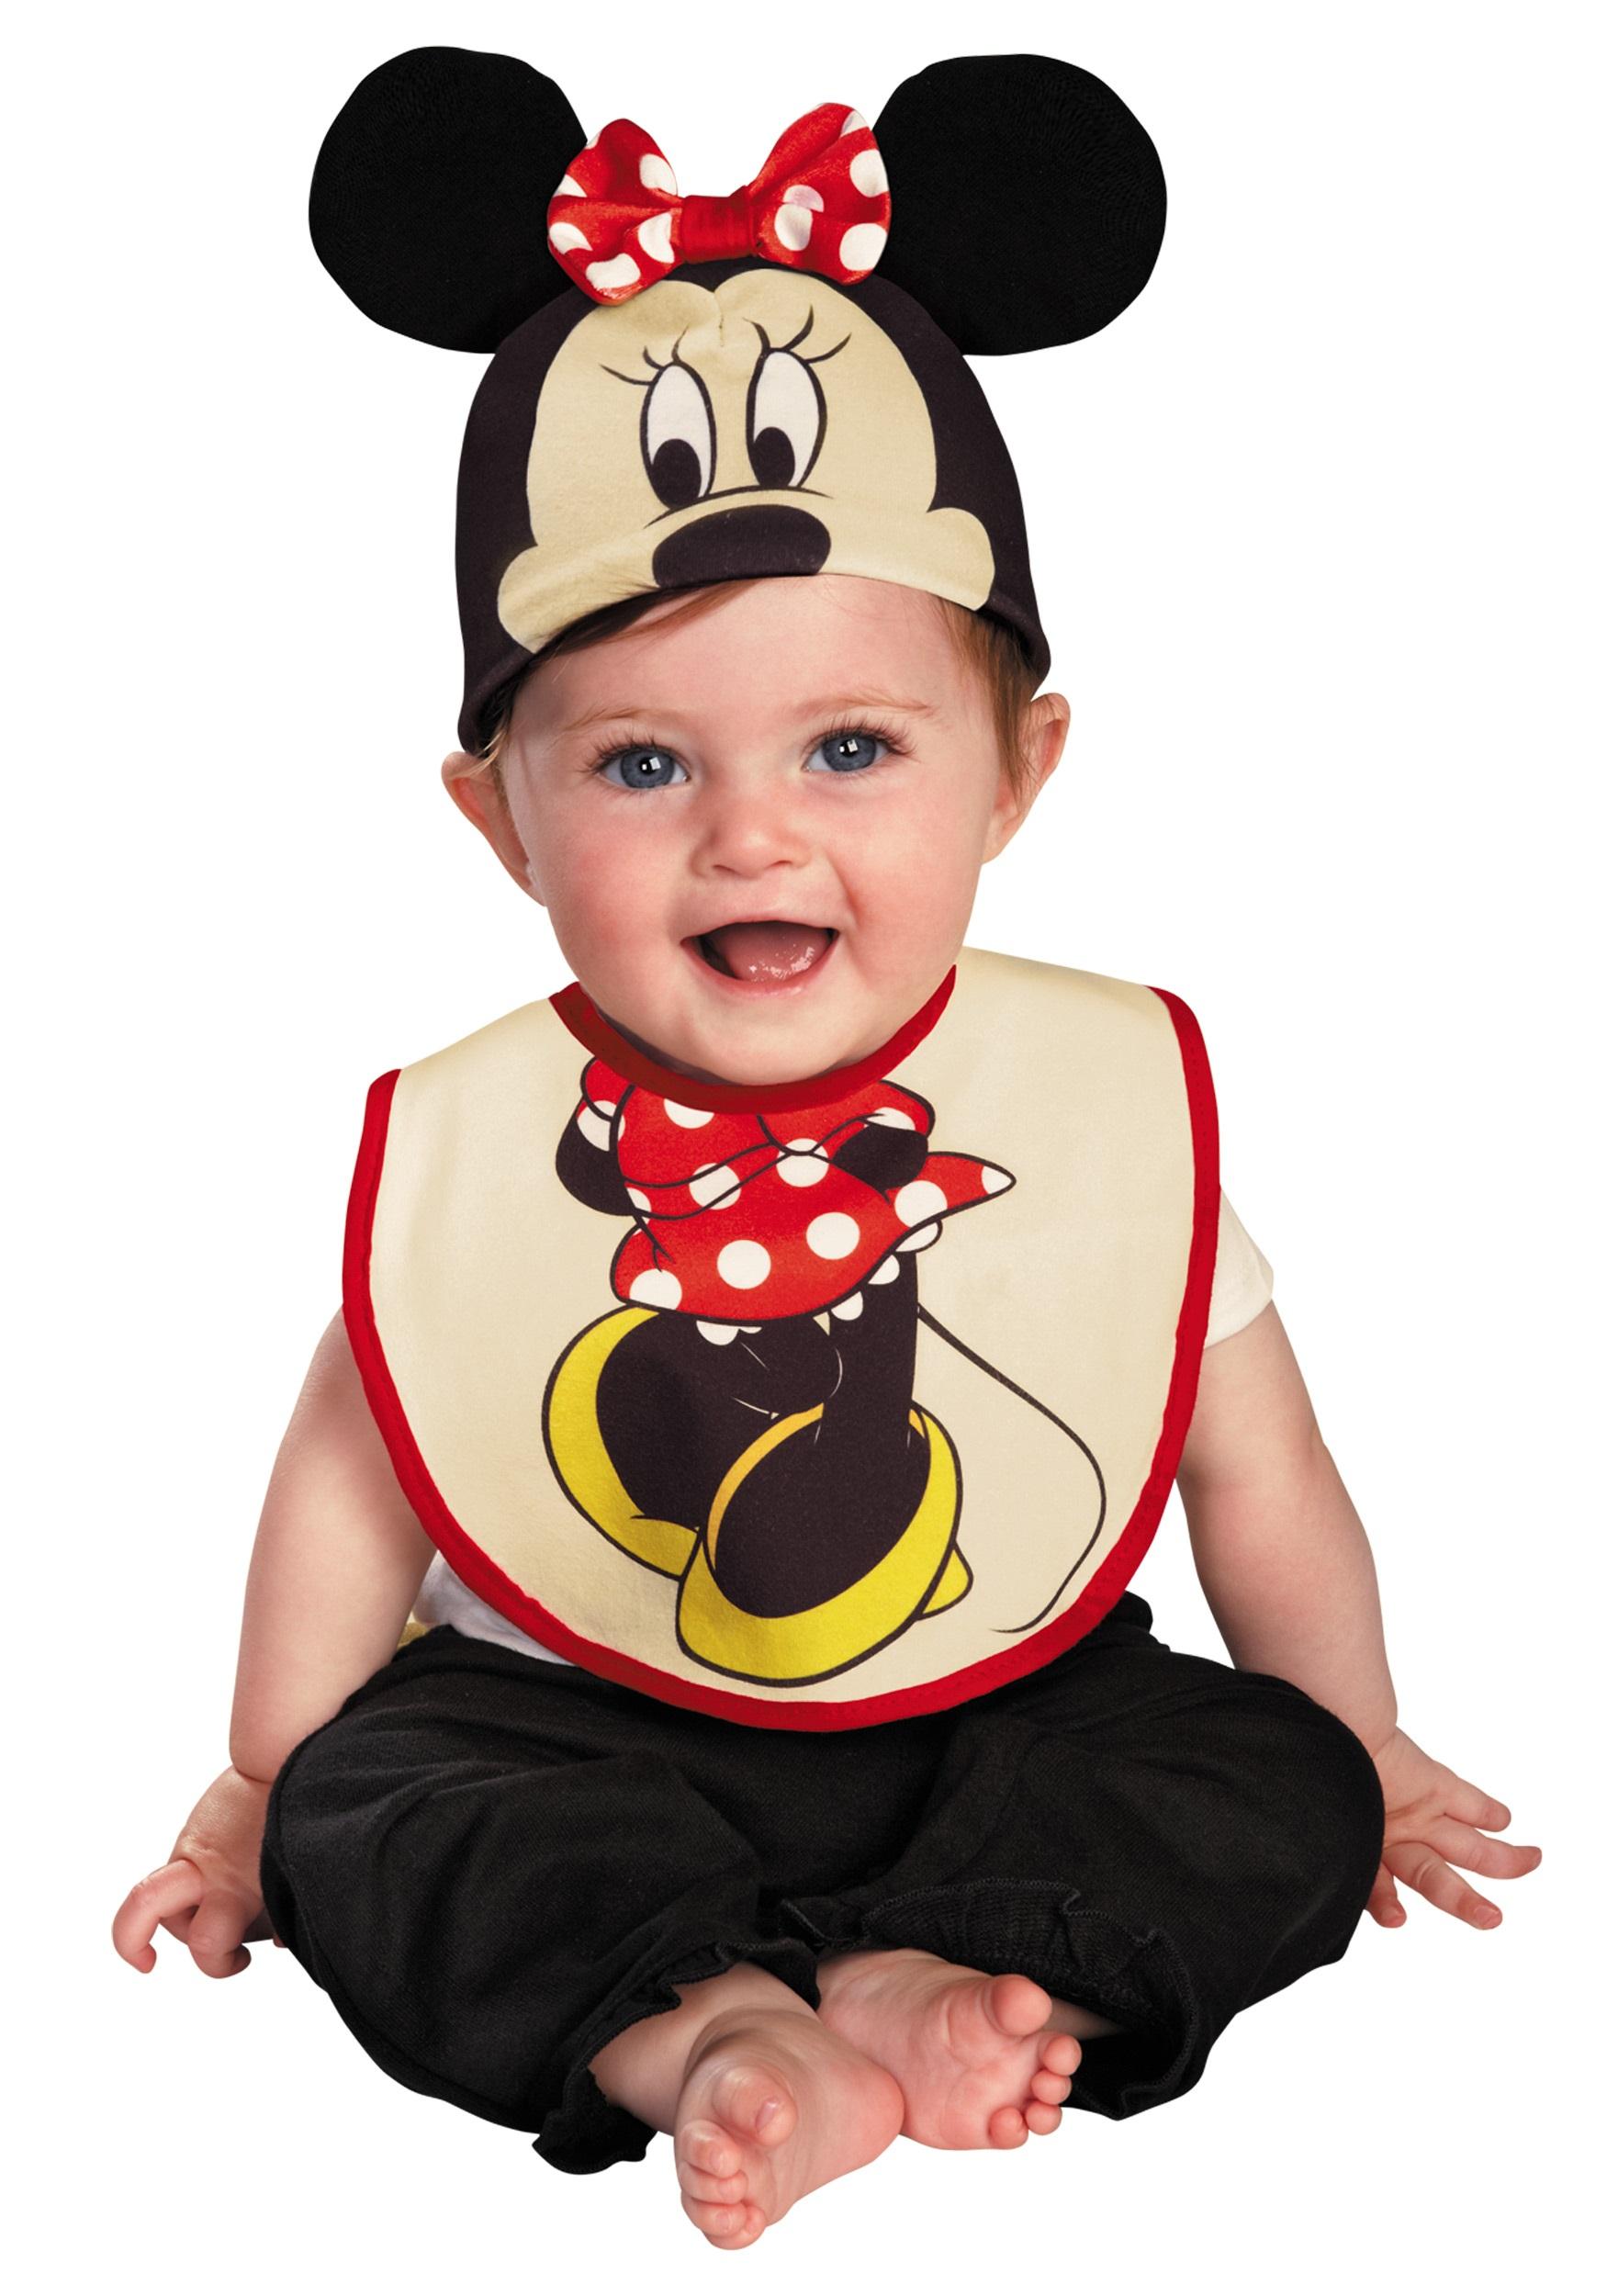 Infant Minnie Mouse Hat and Bib Set  sc 1 st  Halloween Costumes & Infant Minnie Mouse Hat and Bib Set - Halloween Costumes